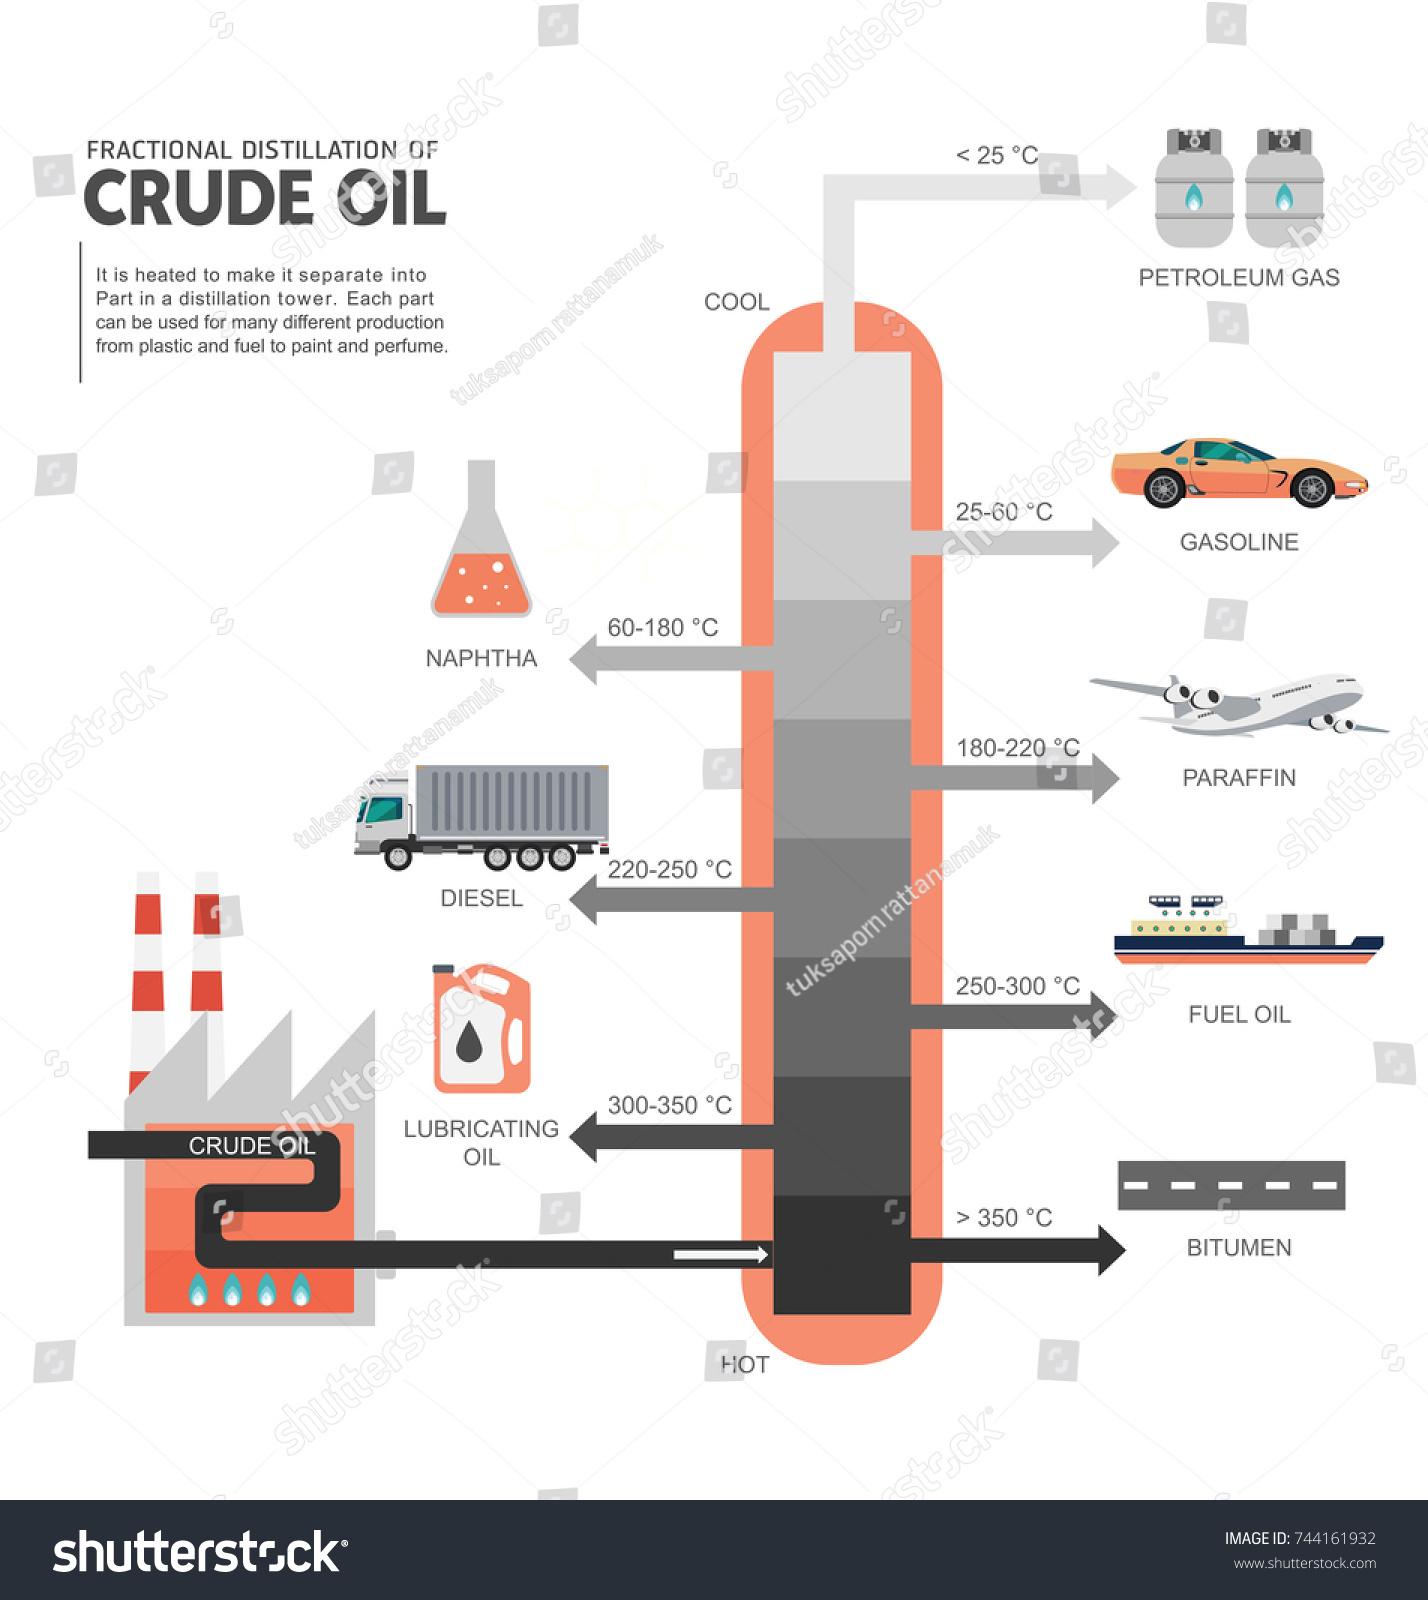 Fractional distillation crude oil diagram illustration stock fractional distillation of crude oil diagram illustration pooptronica